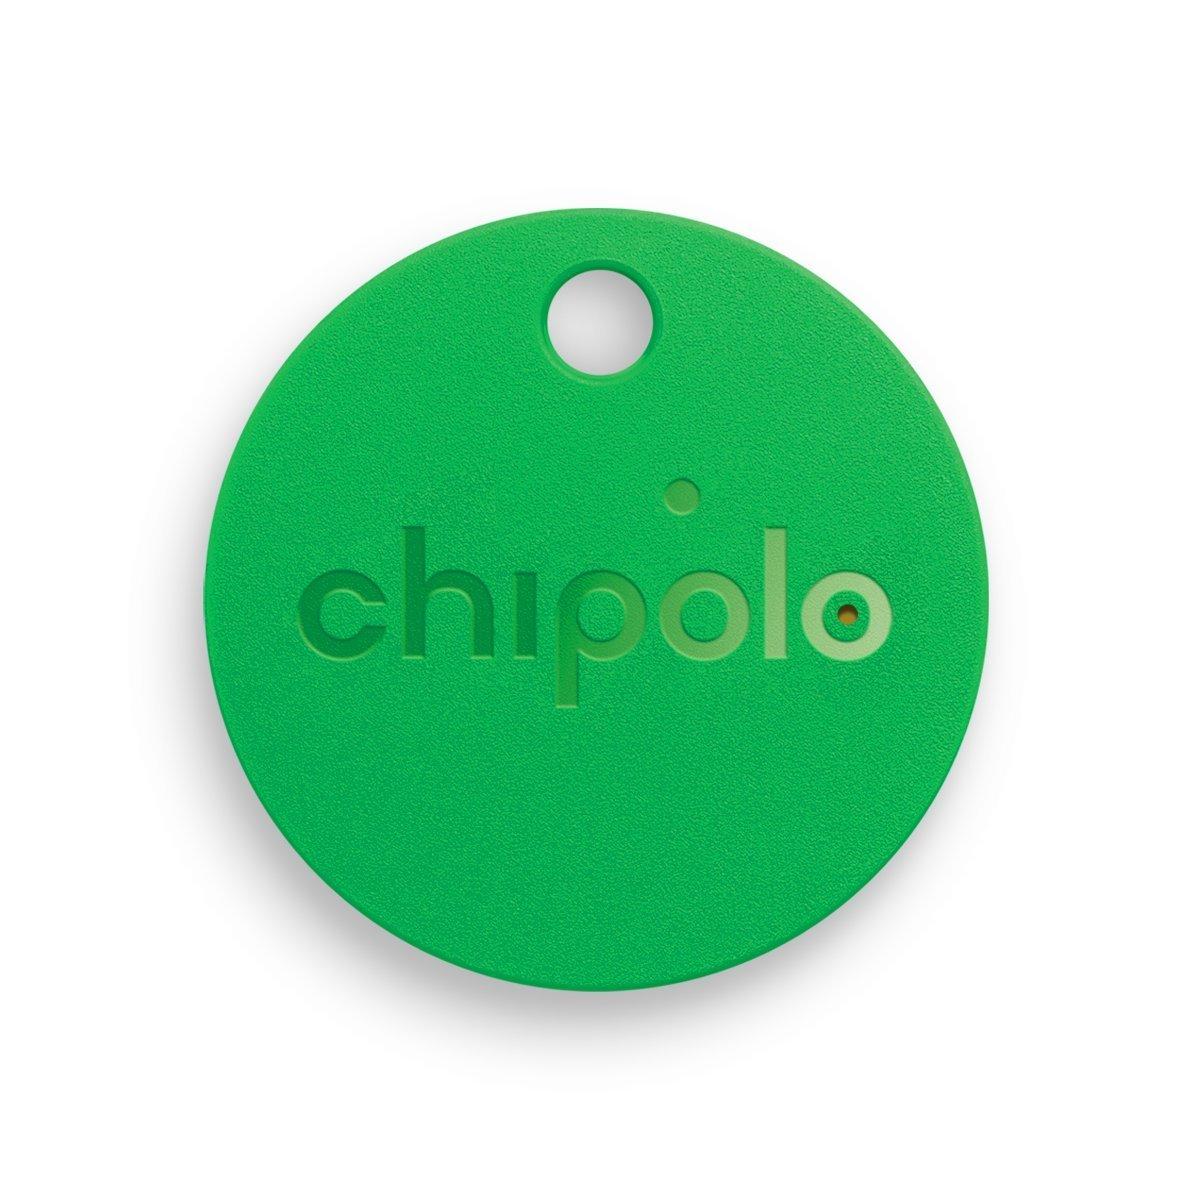 Chipolo Classic 2N Gen - Llavero localizador, Color Verde CHM45SGNR